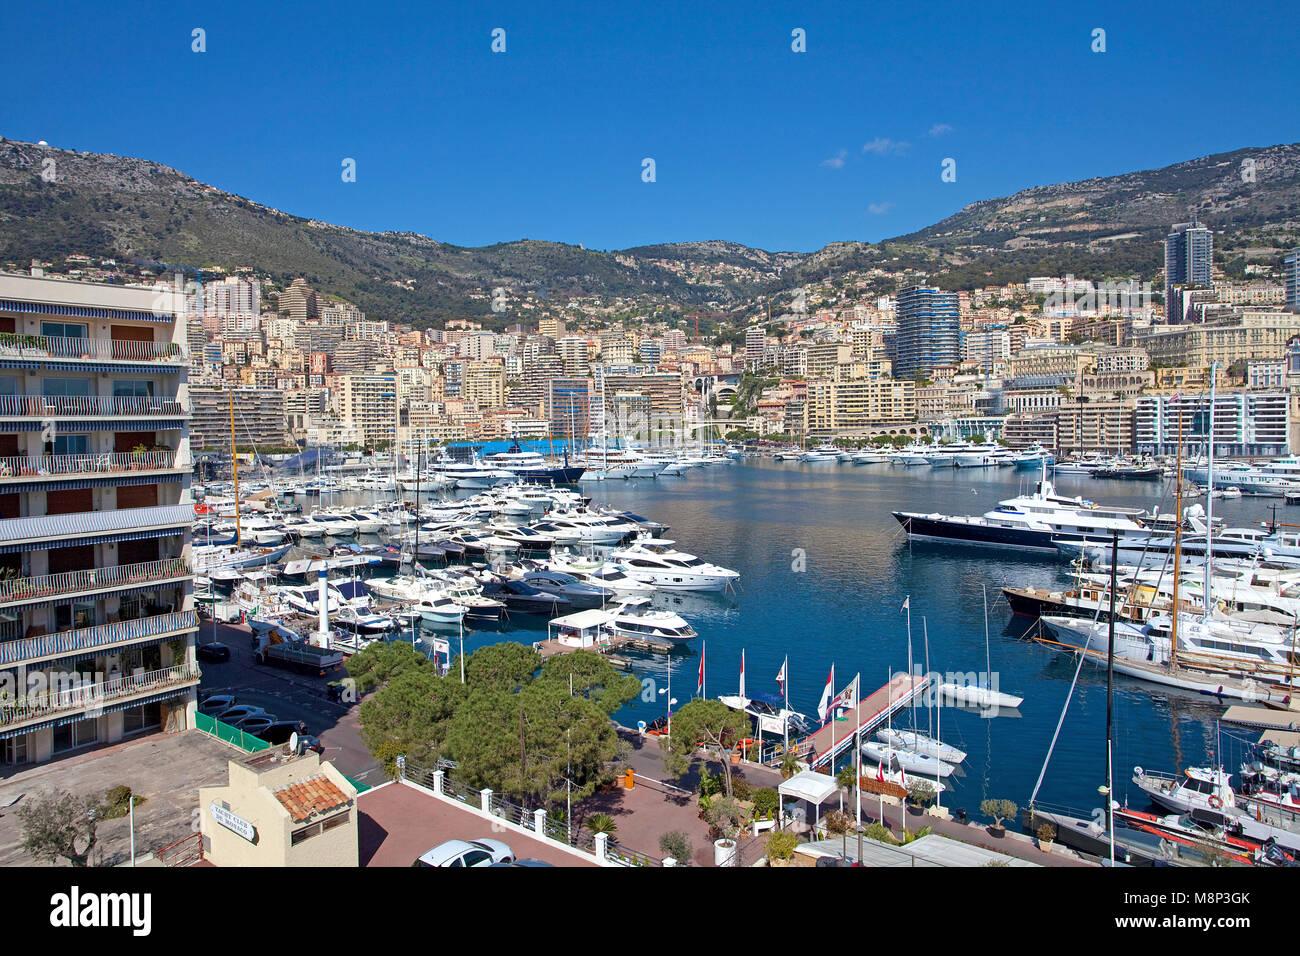 Motor yachts at Marina of Monaco, Principality of Monaco, Côte d'Azur, french riviera, Europe - Stock Image